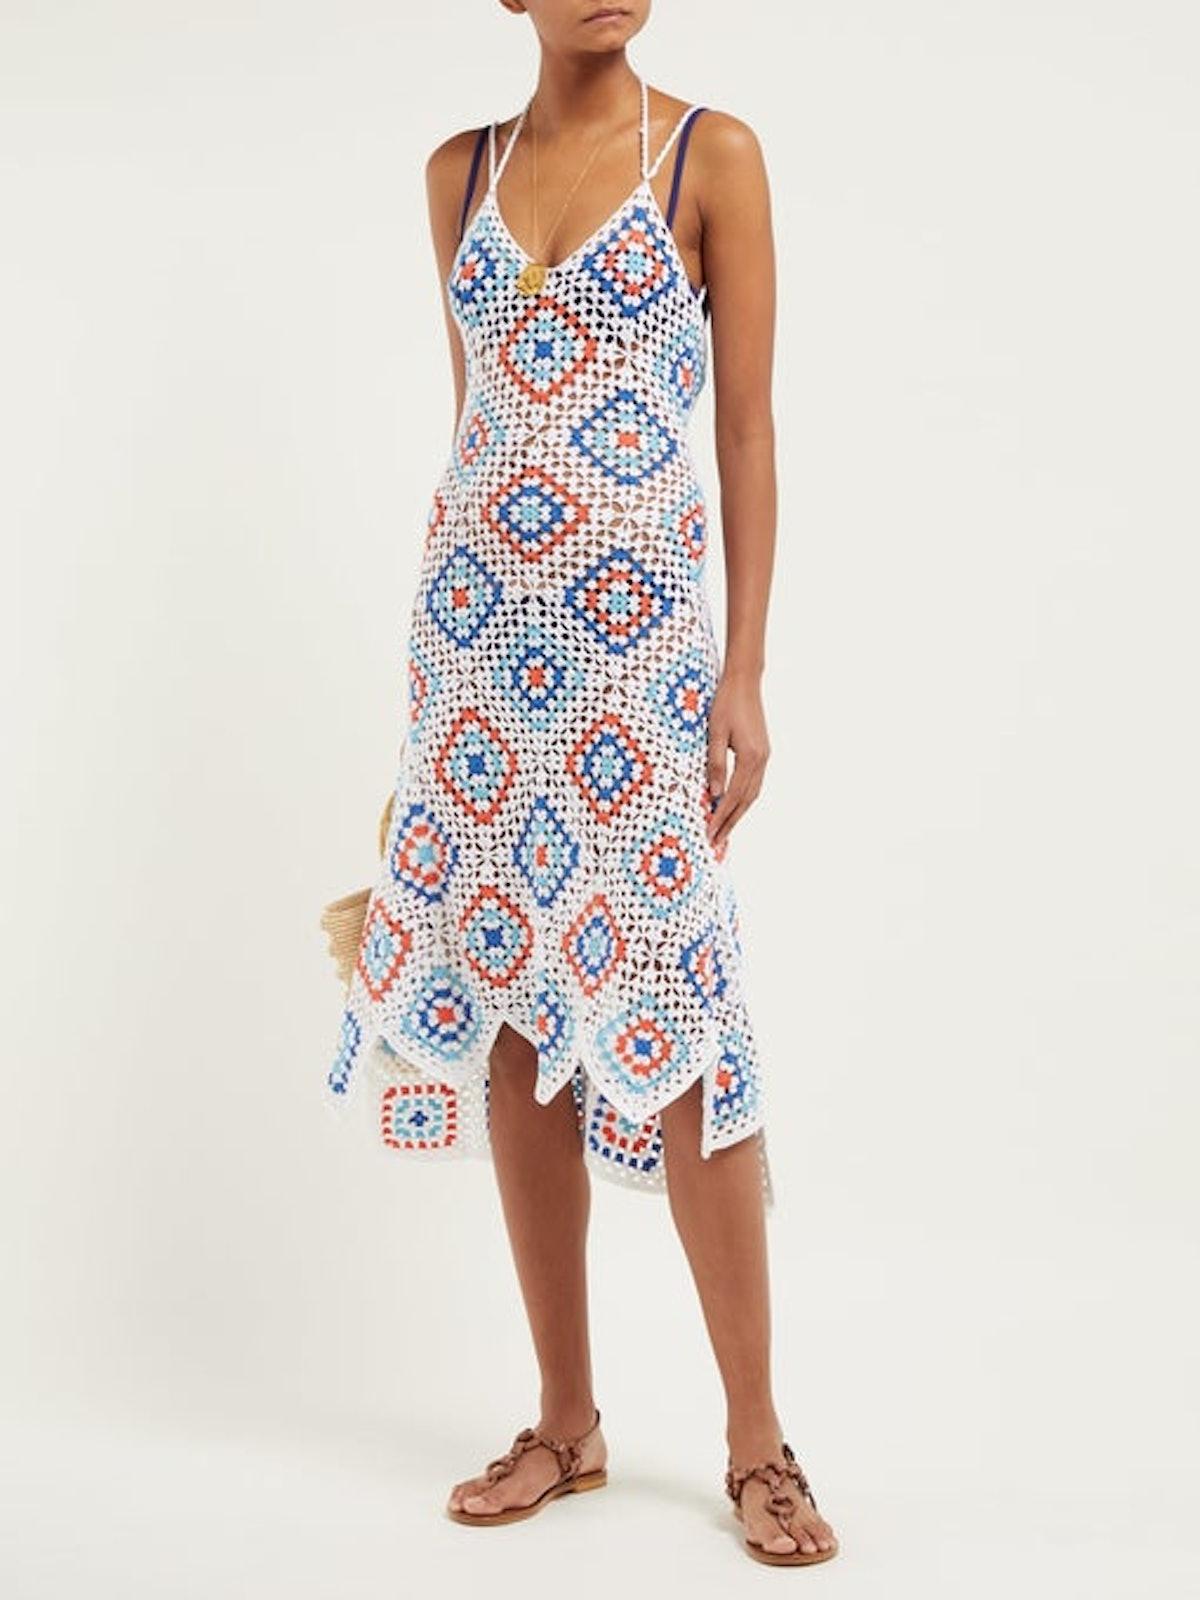 Sexy Granny Crochet-Knit Cotton Midi Dress